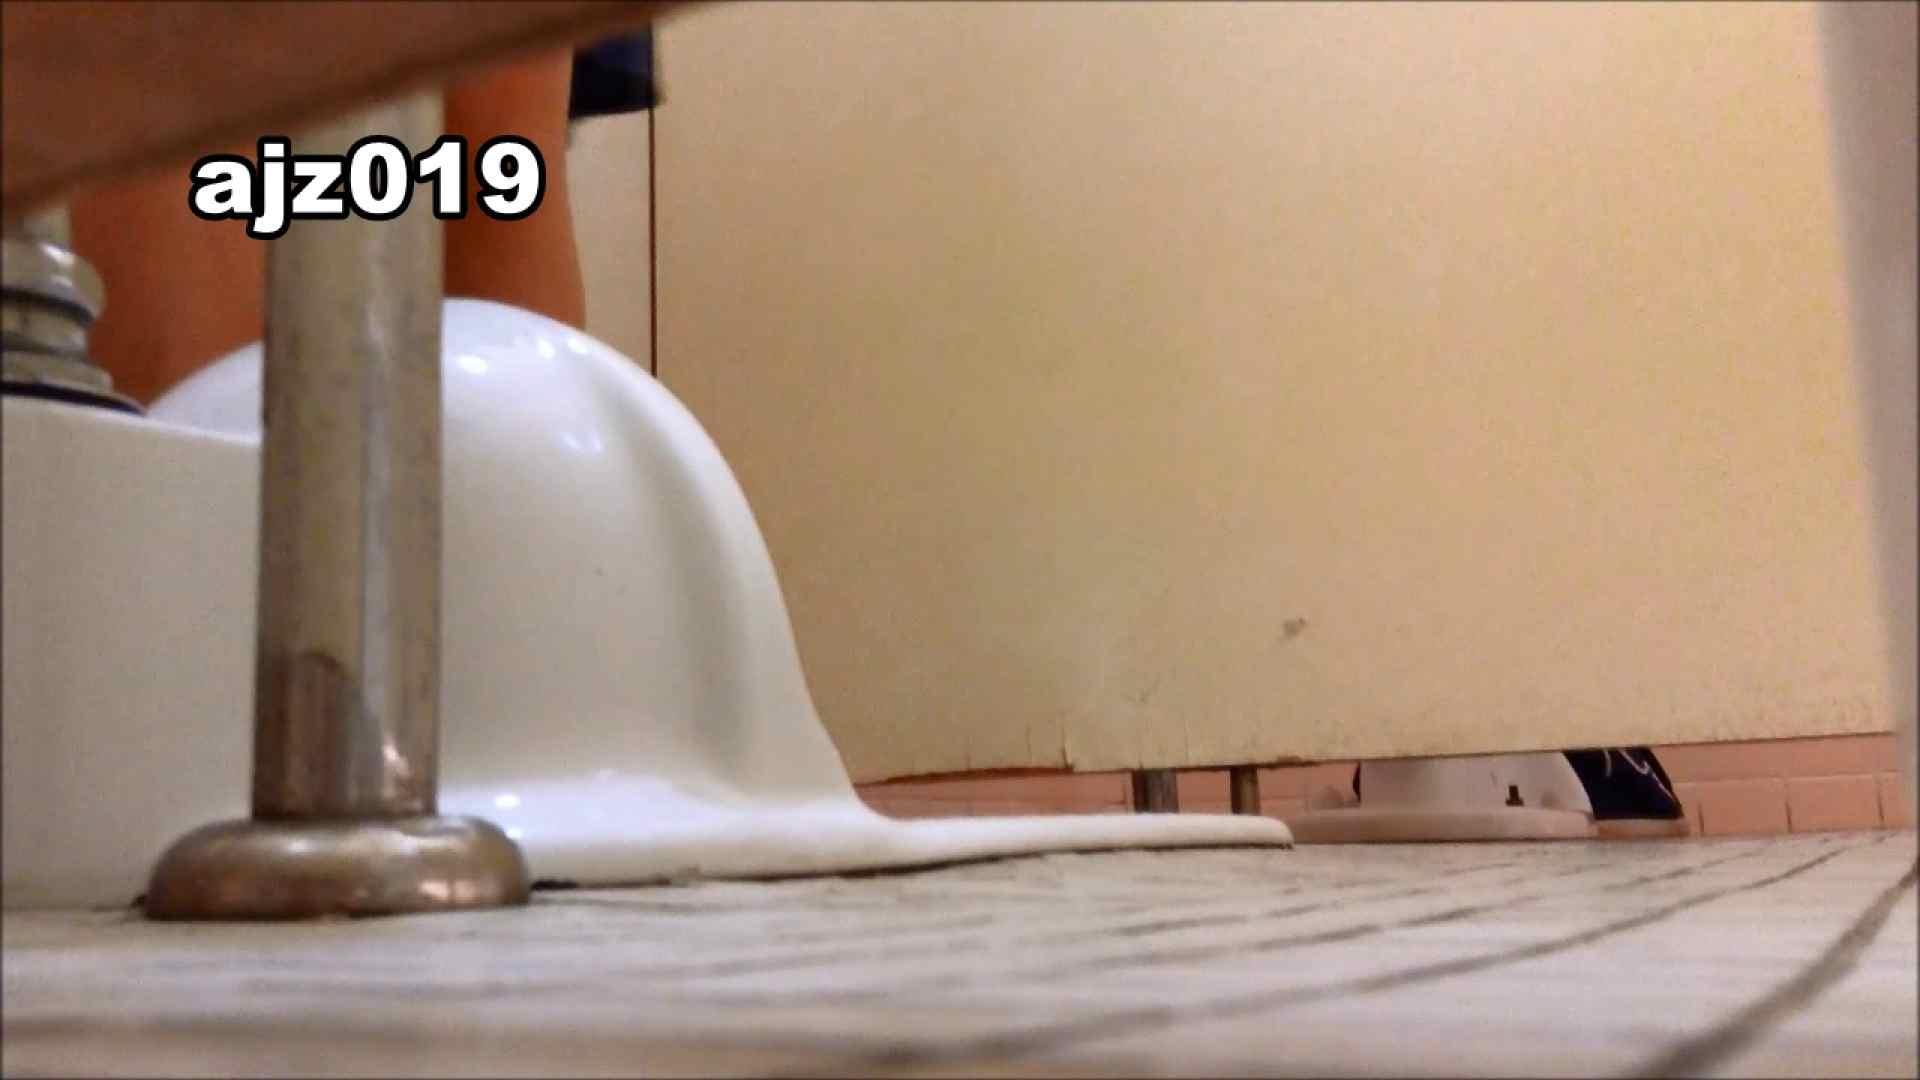 某有名大学女性洗面所 vol.19 和式 のぞき 93PIX 3